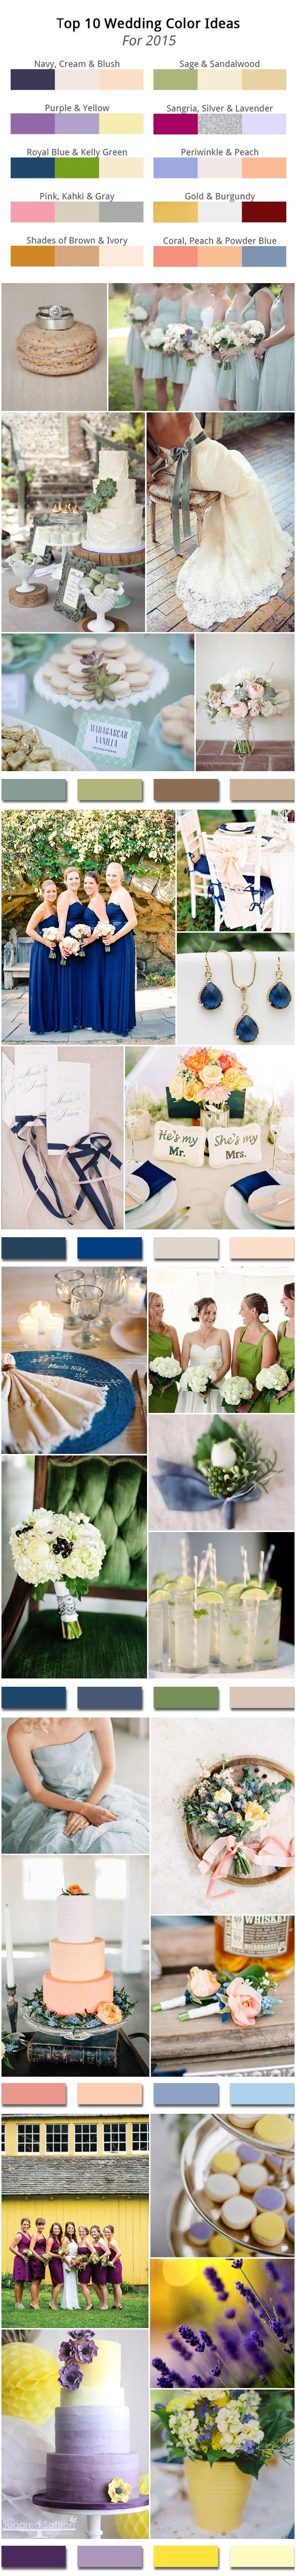 Top 10 Wedding Color Ideas for 2015 Trends #elegantweddinginvites #wedding colors